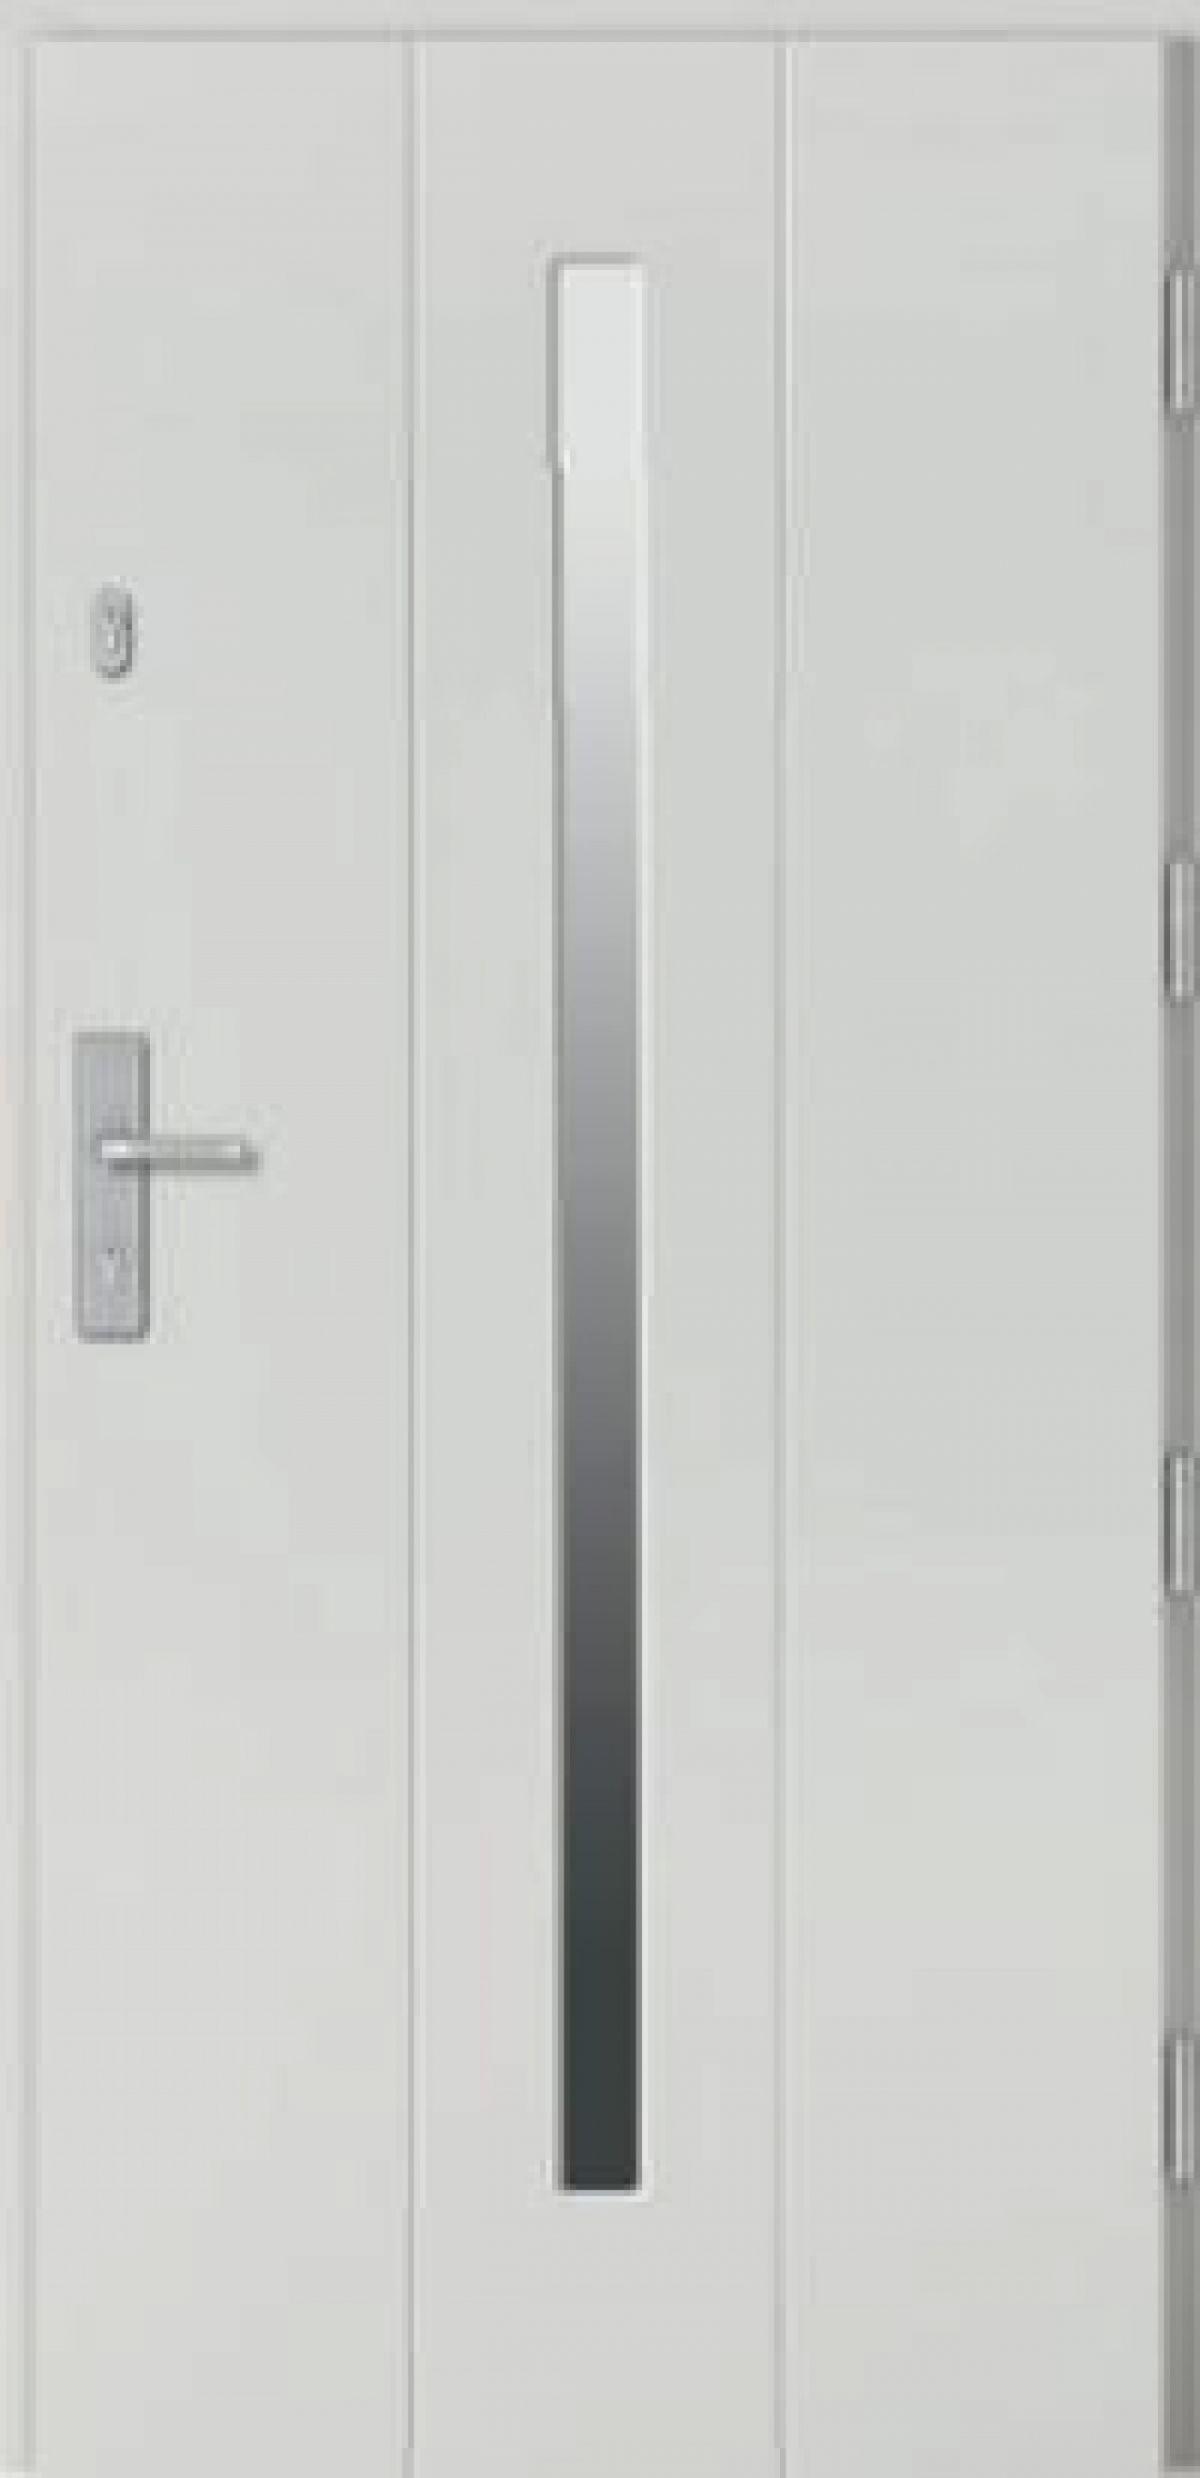 DB 253a